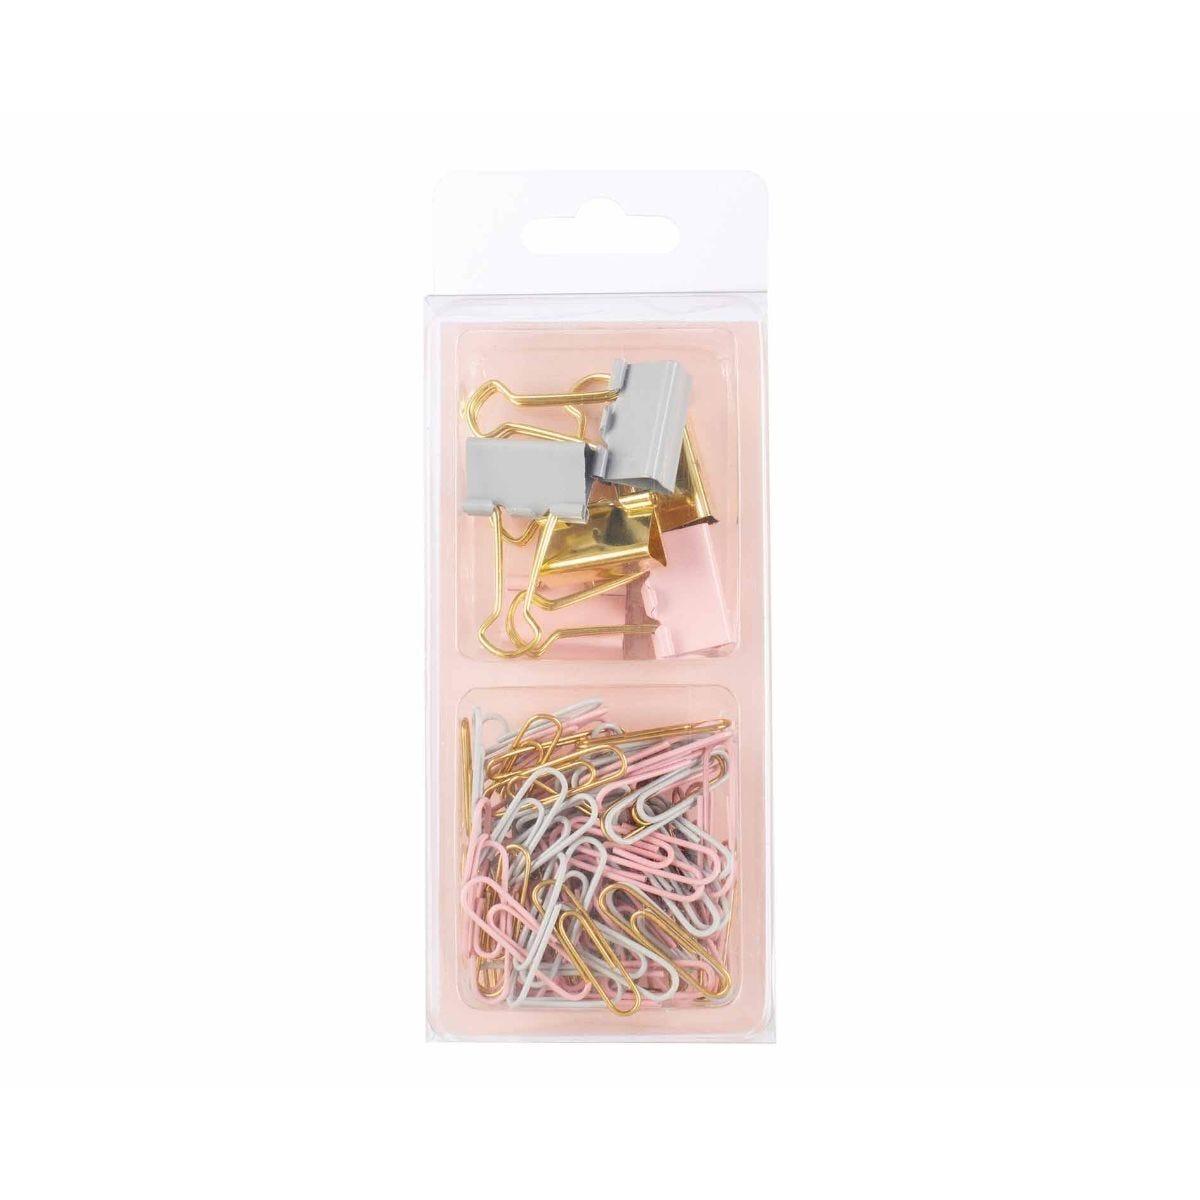 Ryman Paper Clip and Binder Clip Set